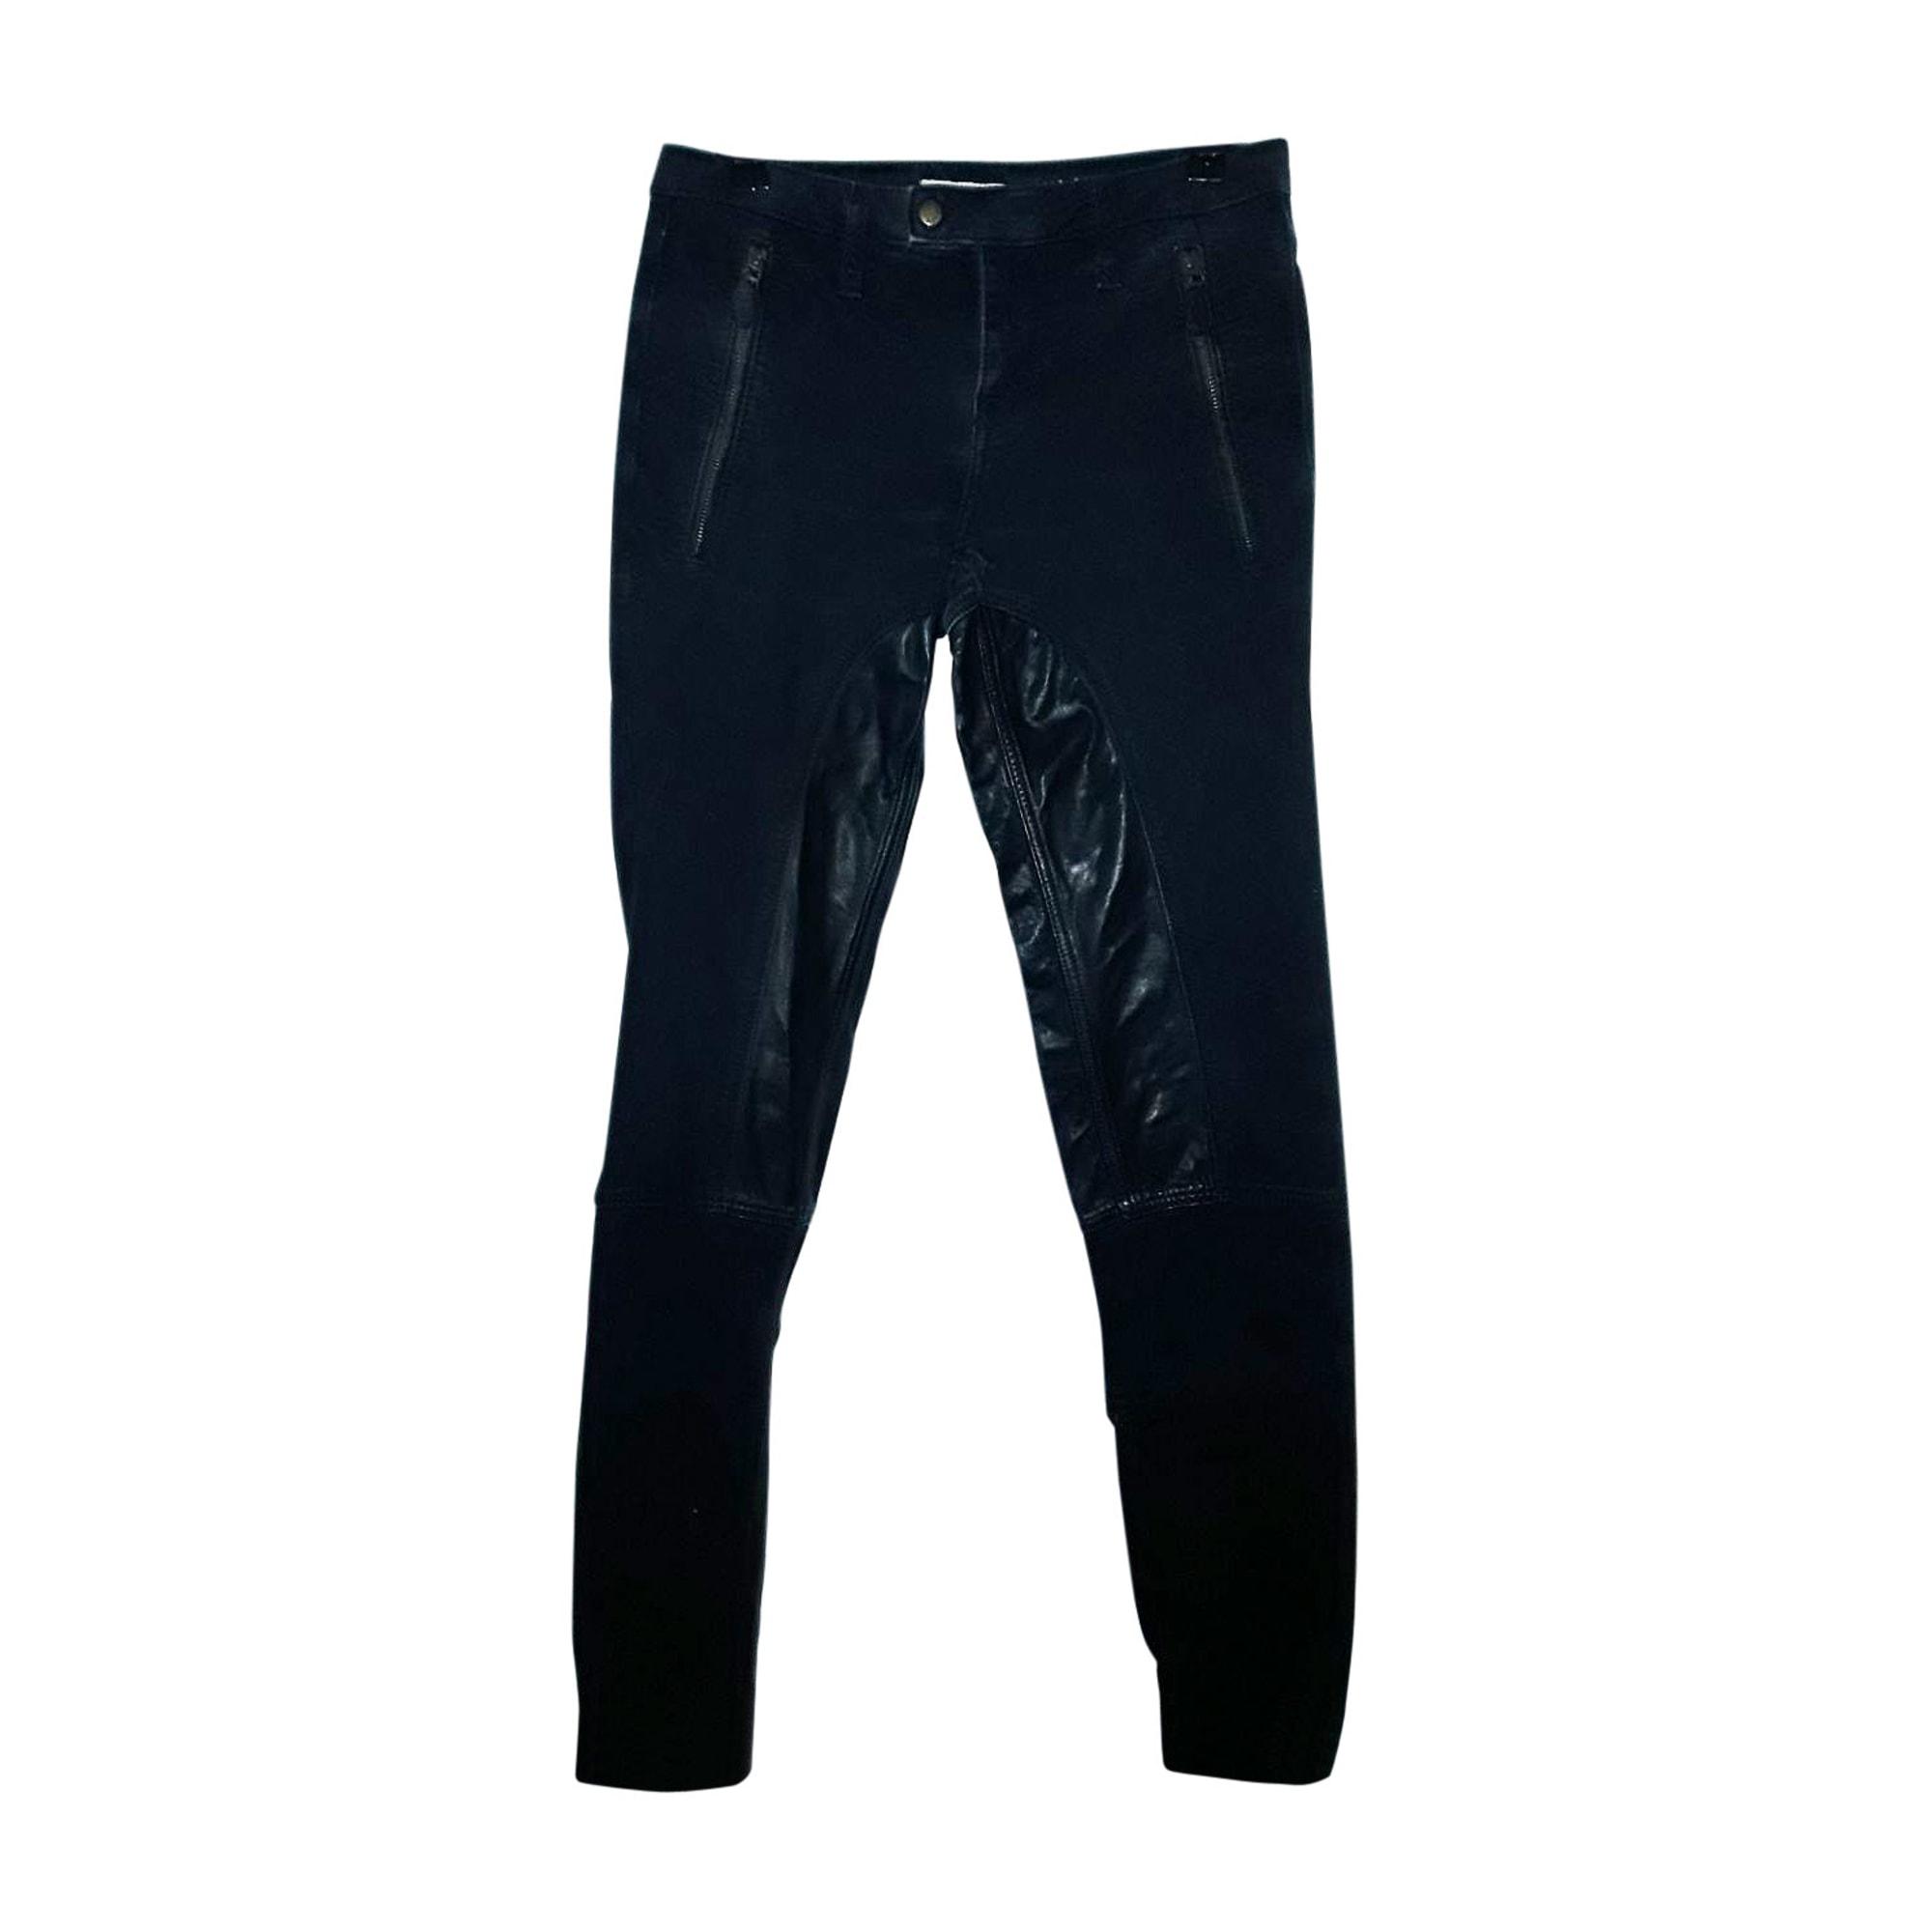 Pantalon slim, cigarette BURBERRY Noir